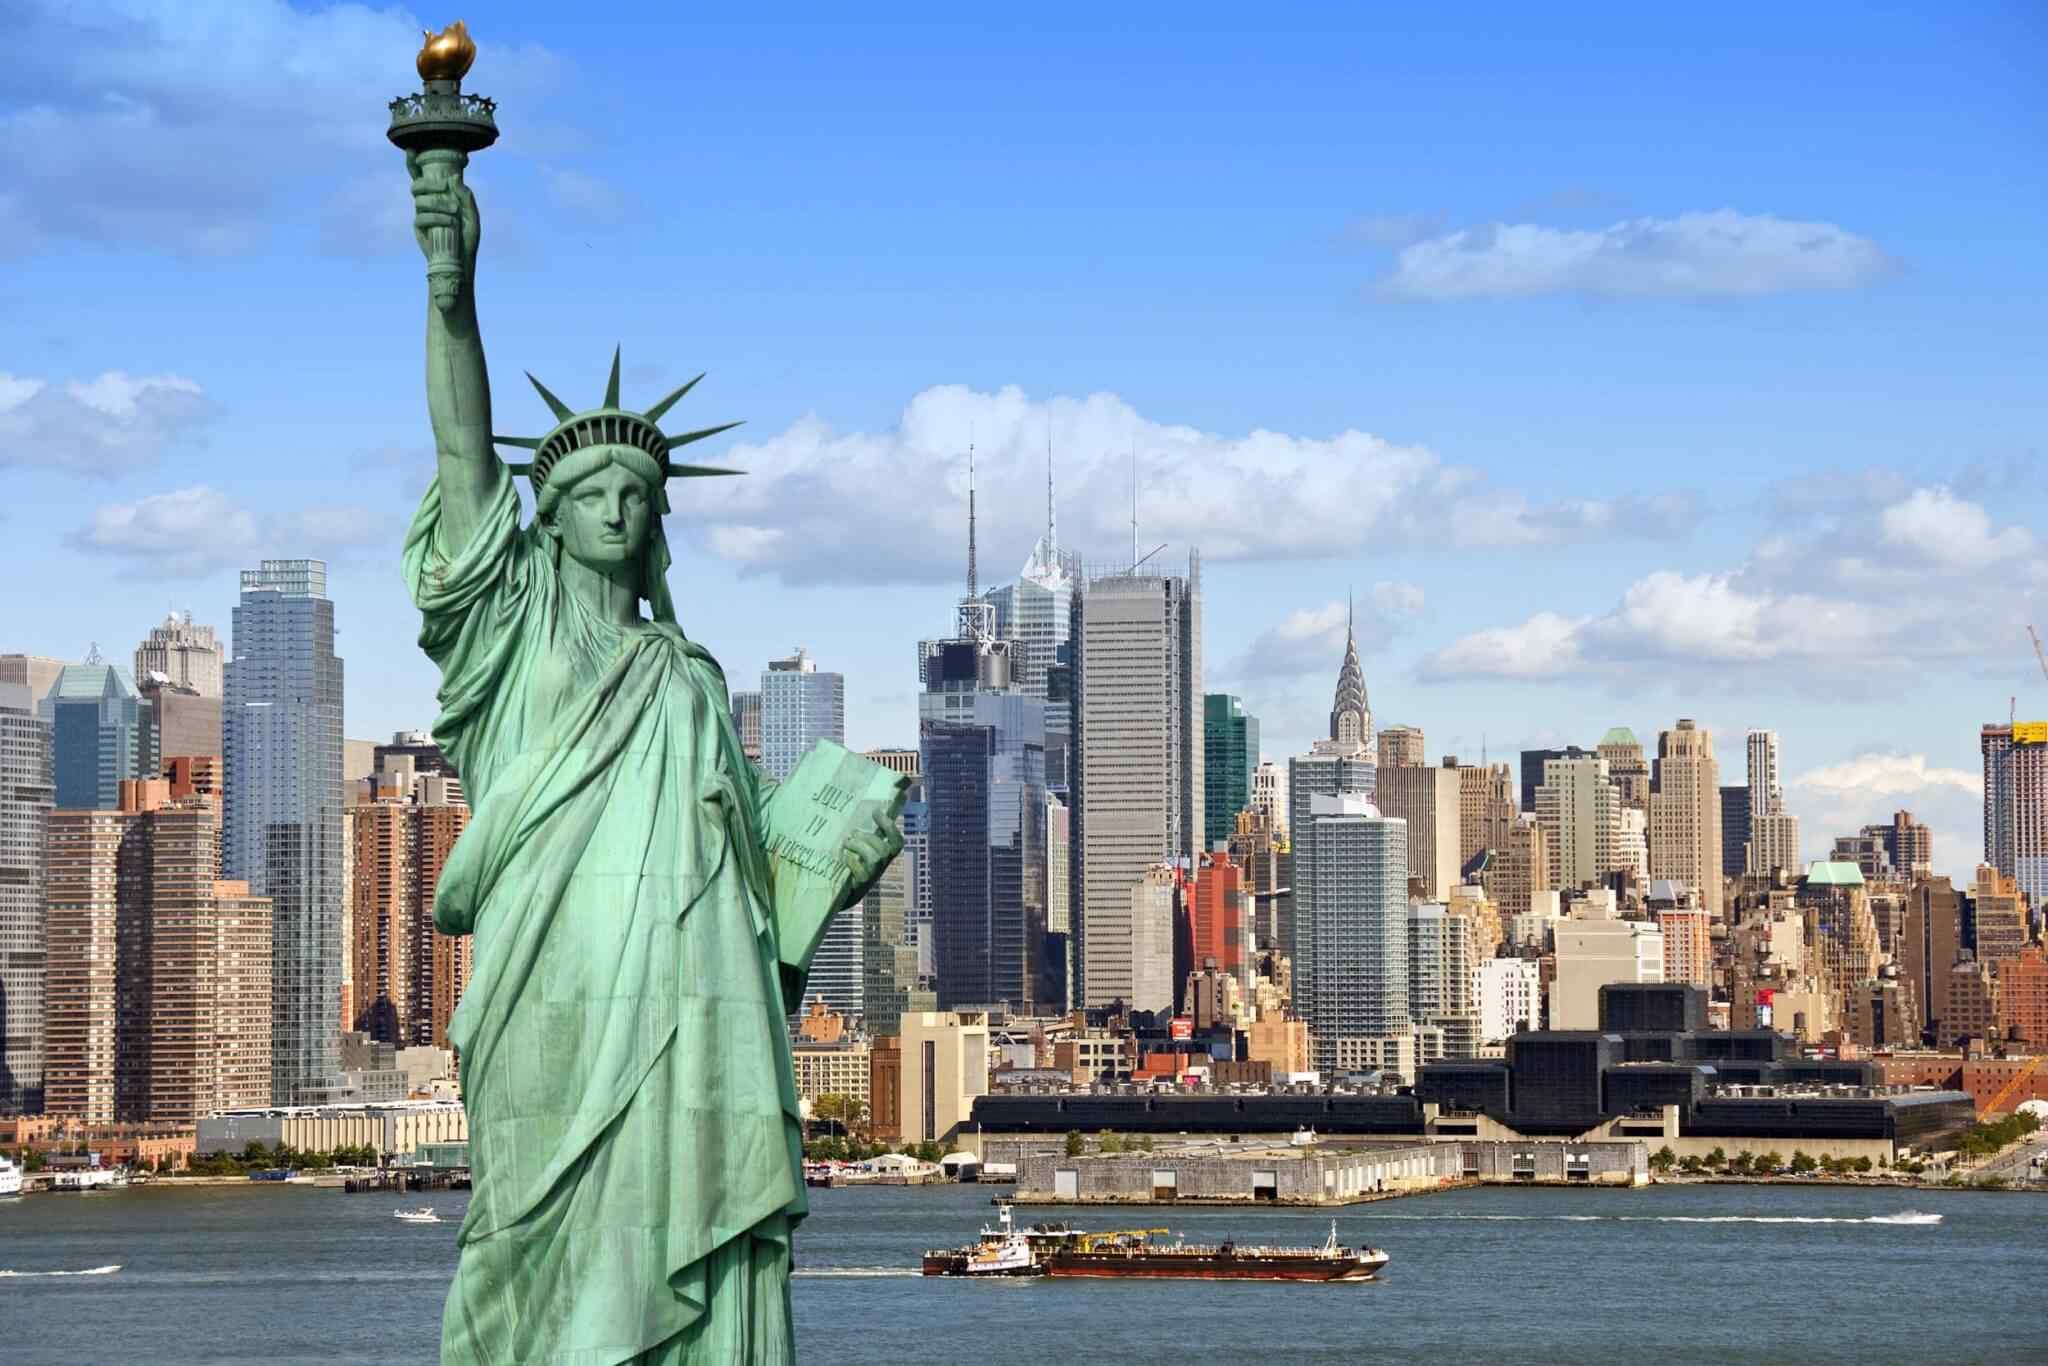 https://www.lukart.cz/wp-content/uploads/2018/09/destination-new-york-01.jpg